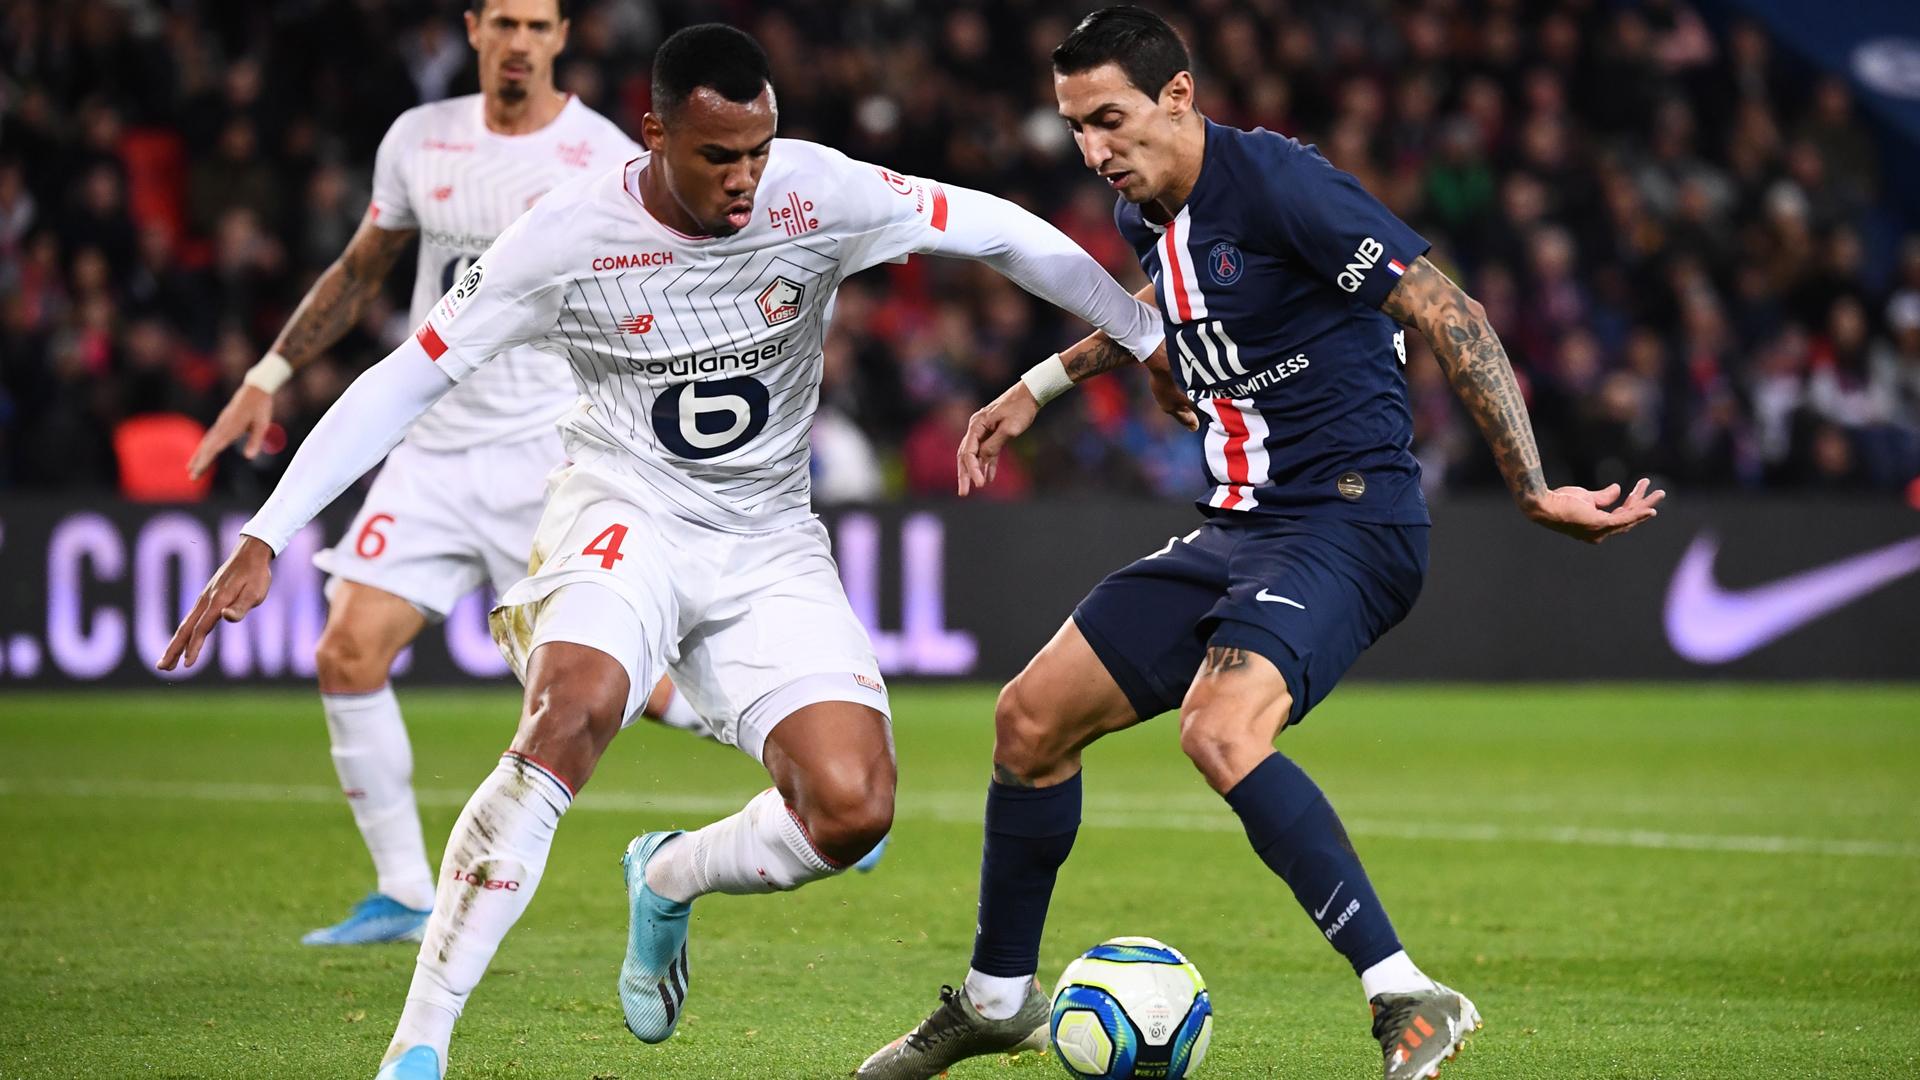 'An absolute machine' - Premier League target Gabriel praised by Lille president